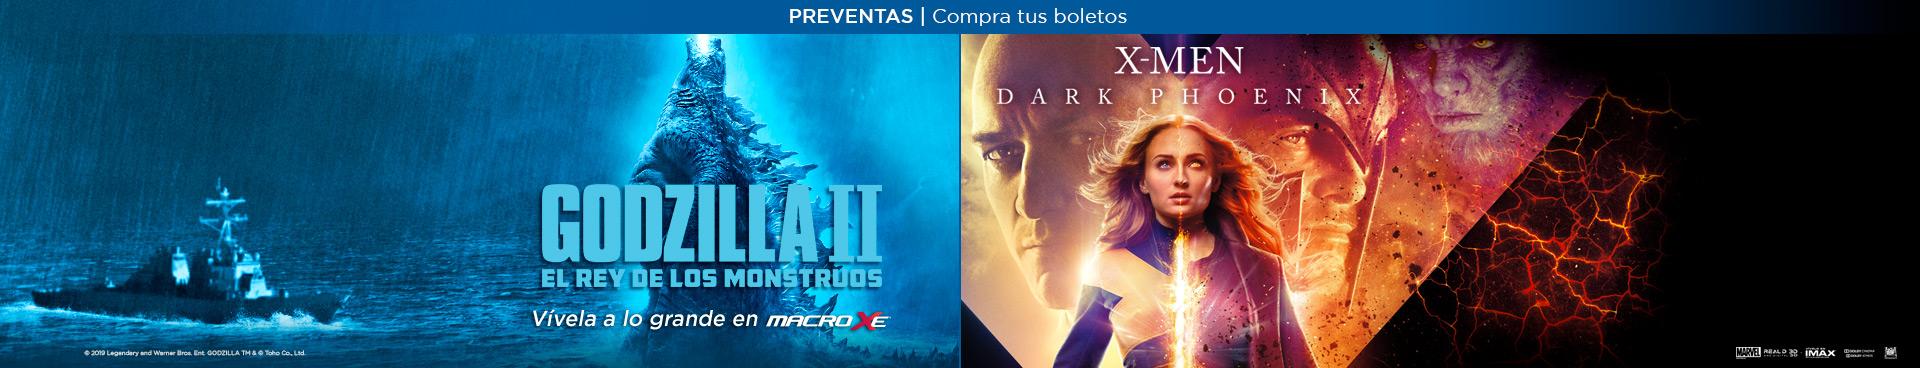 Preventas: Godzilla / X-Men Dark Phoenix